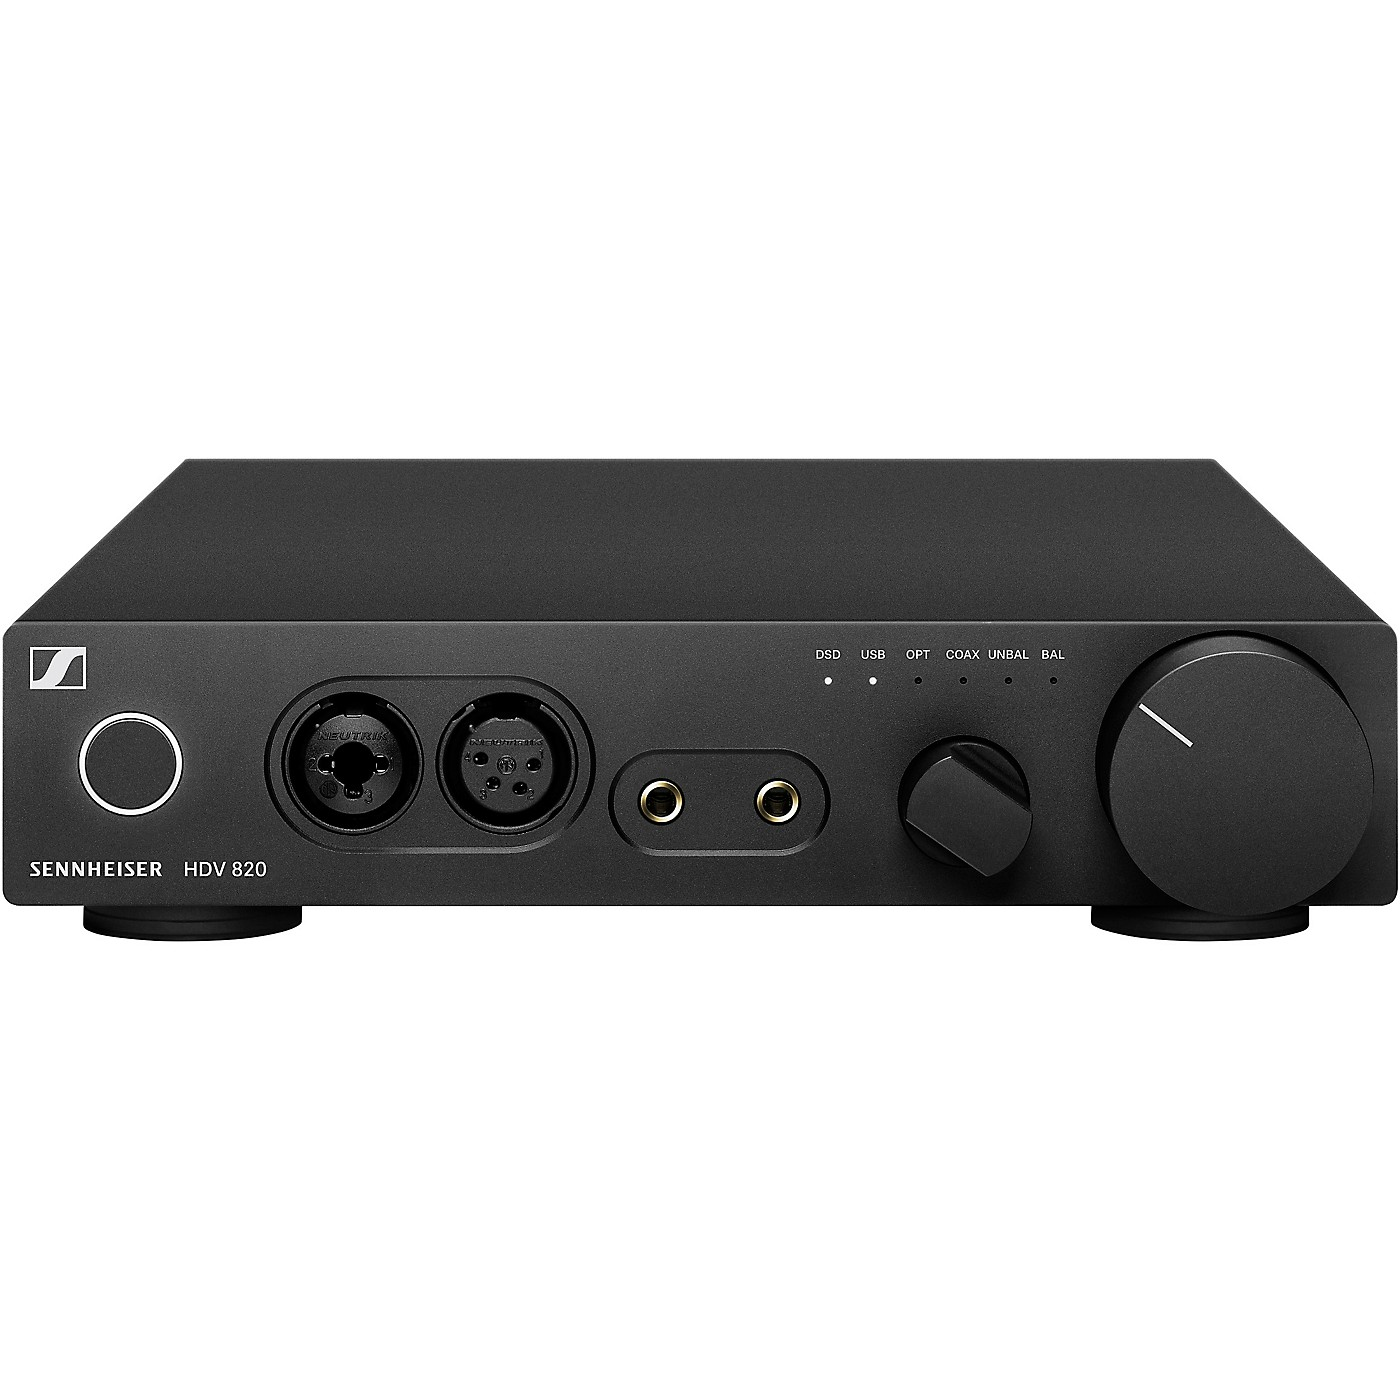 Sennheiser HDV 820 Digital Headphones Amplifier thumbnail